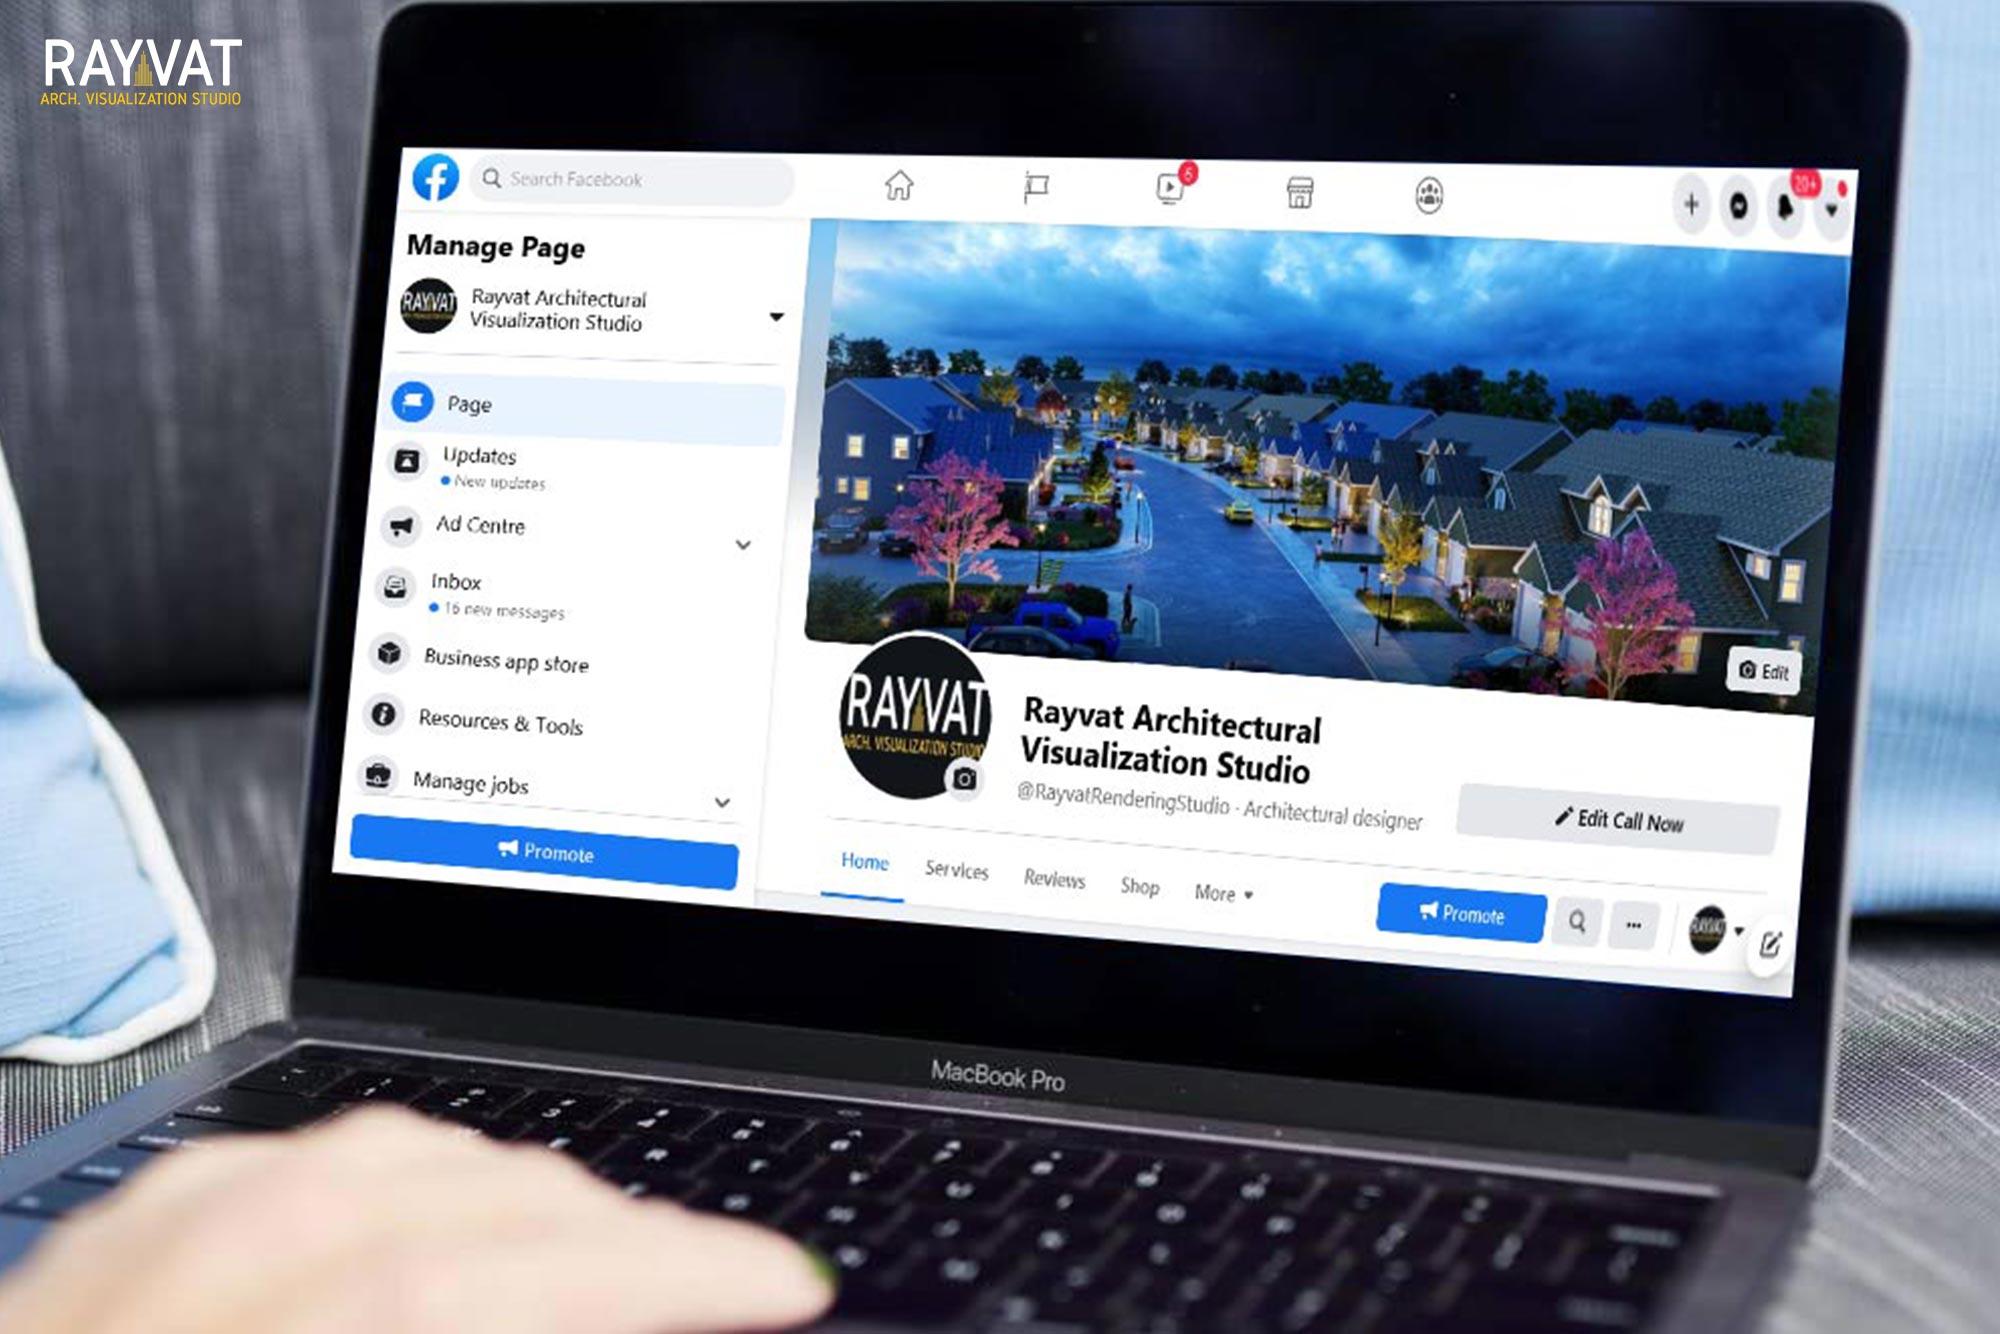 Facebook page screen short